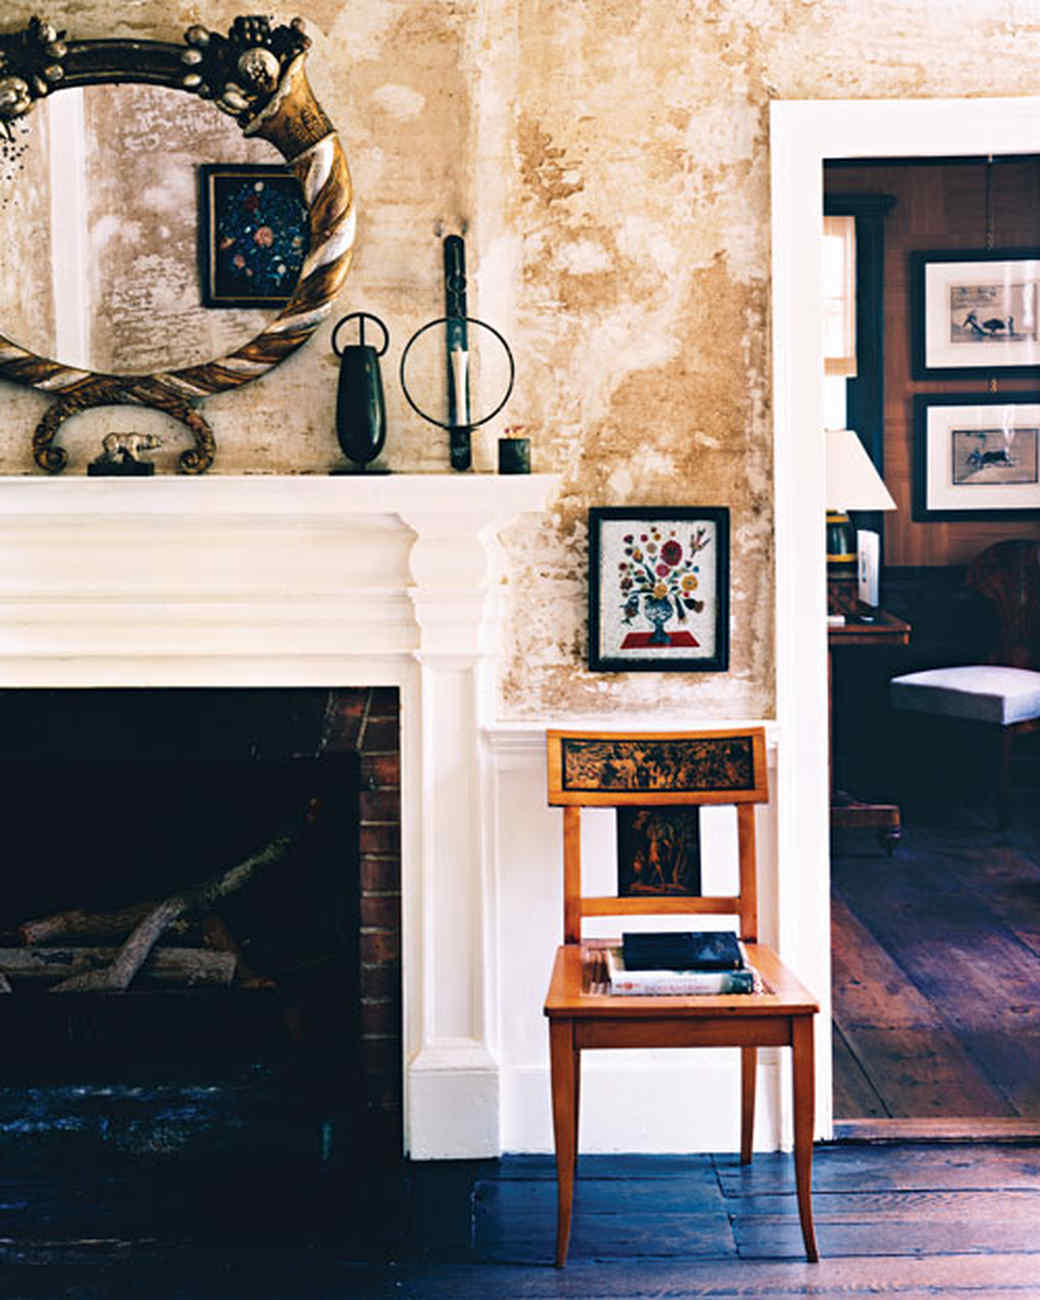 mla103203_0408_fireplace.jpg